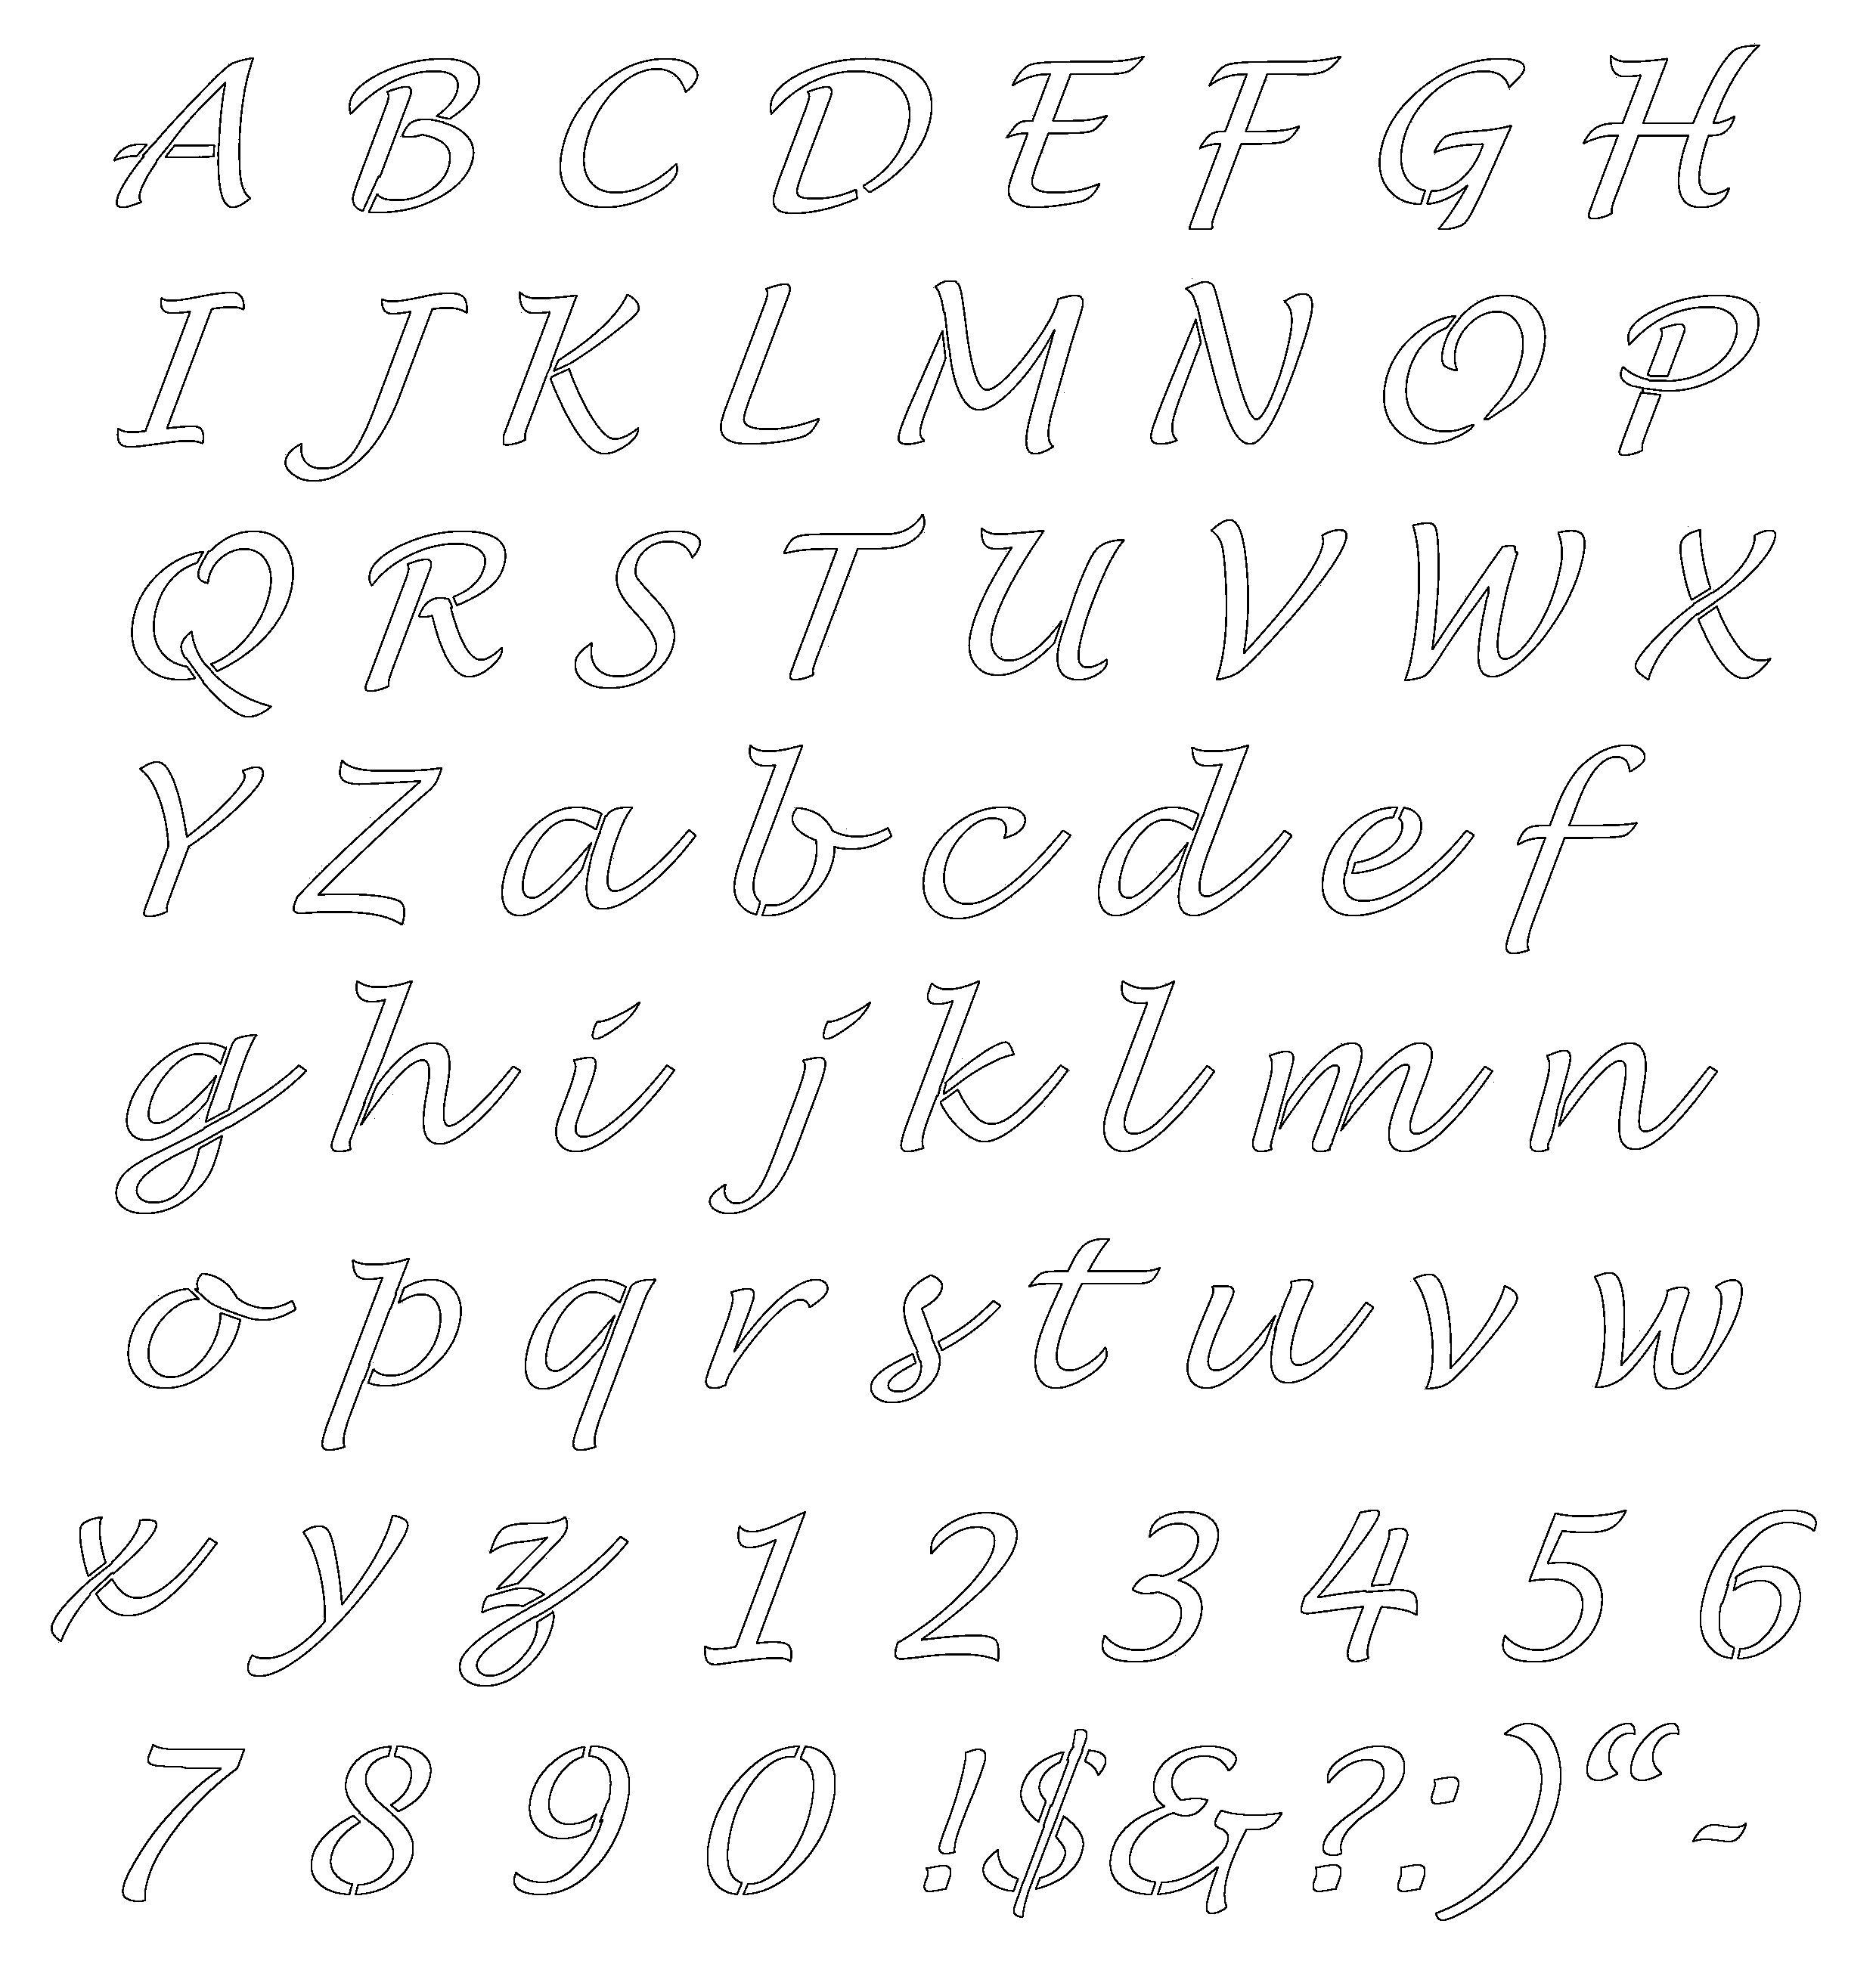 Image Result For Fancy Alphabet Letters Templates | Alphabets - Free Printable Fancy Number Stencils